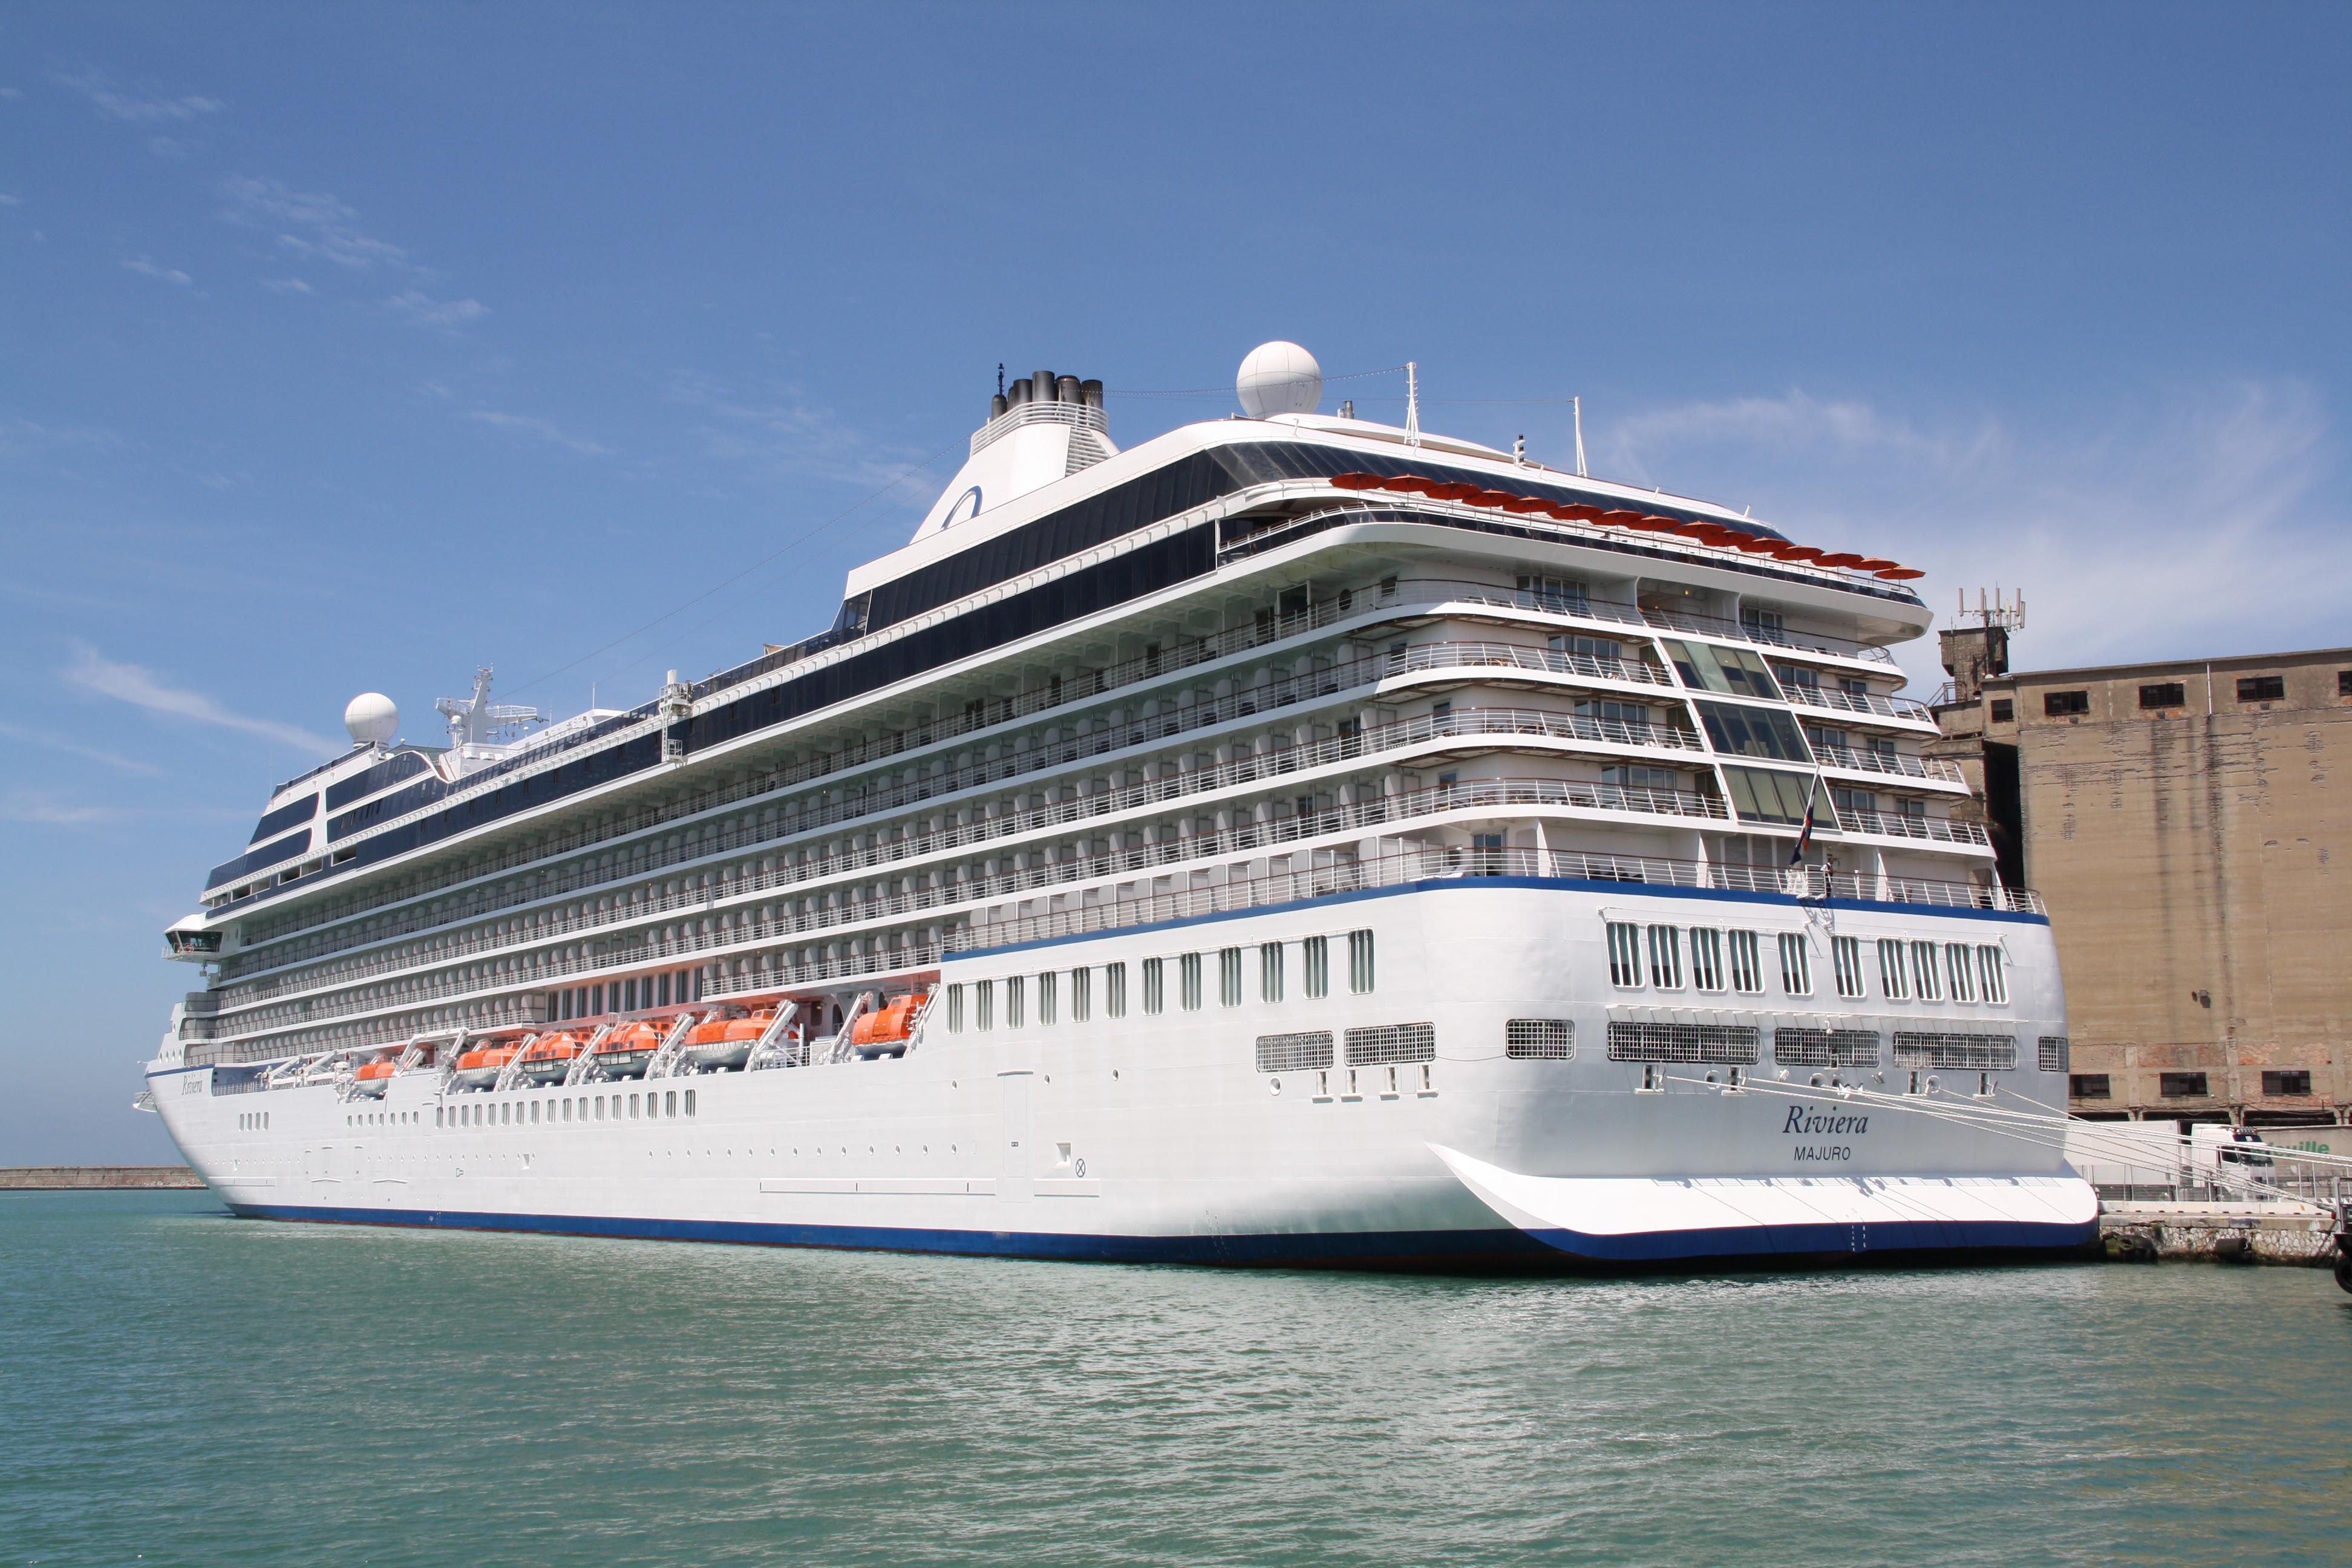 Oceania Cruise Ship Riviera | Fitbudha.com